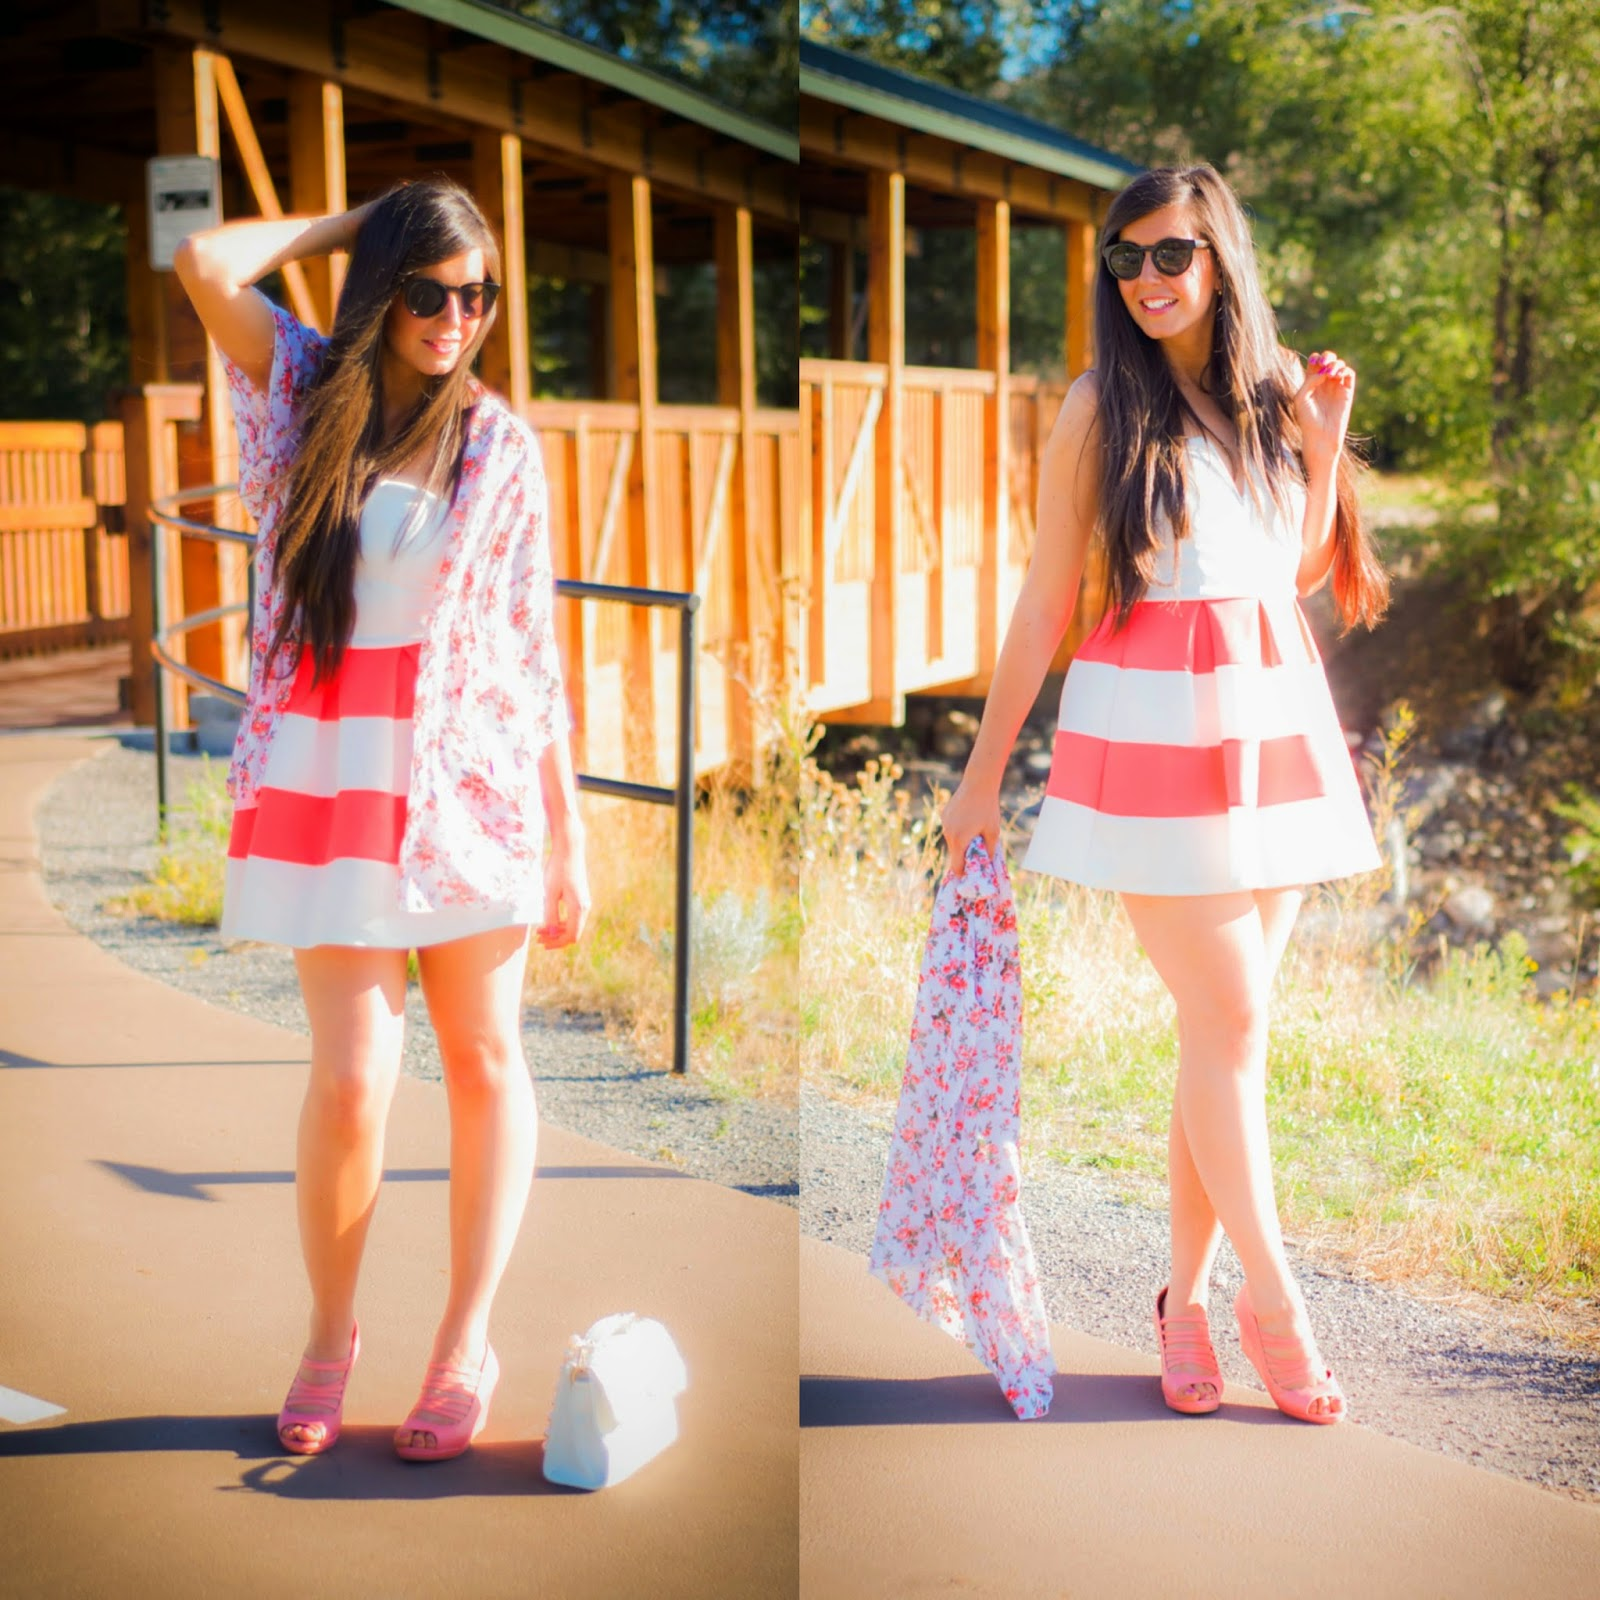 charlotte russe, kimono, skater dress, baby doll dress, strapless dress, amiclubwear shoes, strap wedges, wedges, 2 ways to wear a skater dress, pink and white dress, cute,